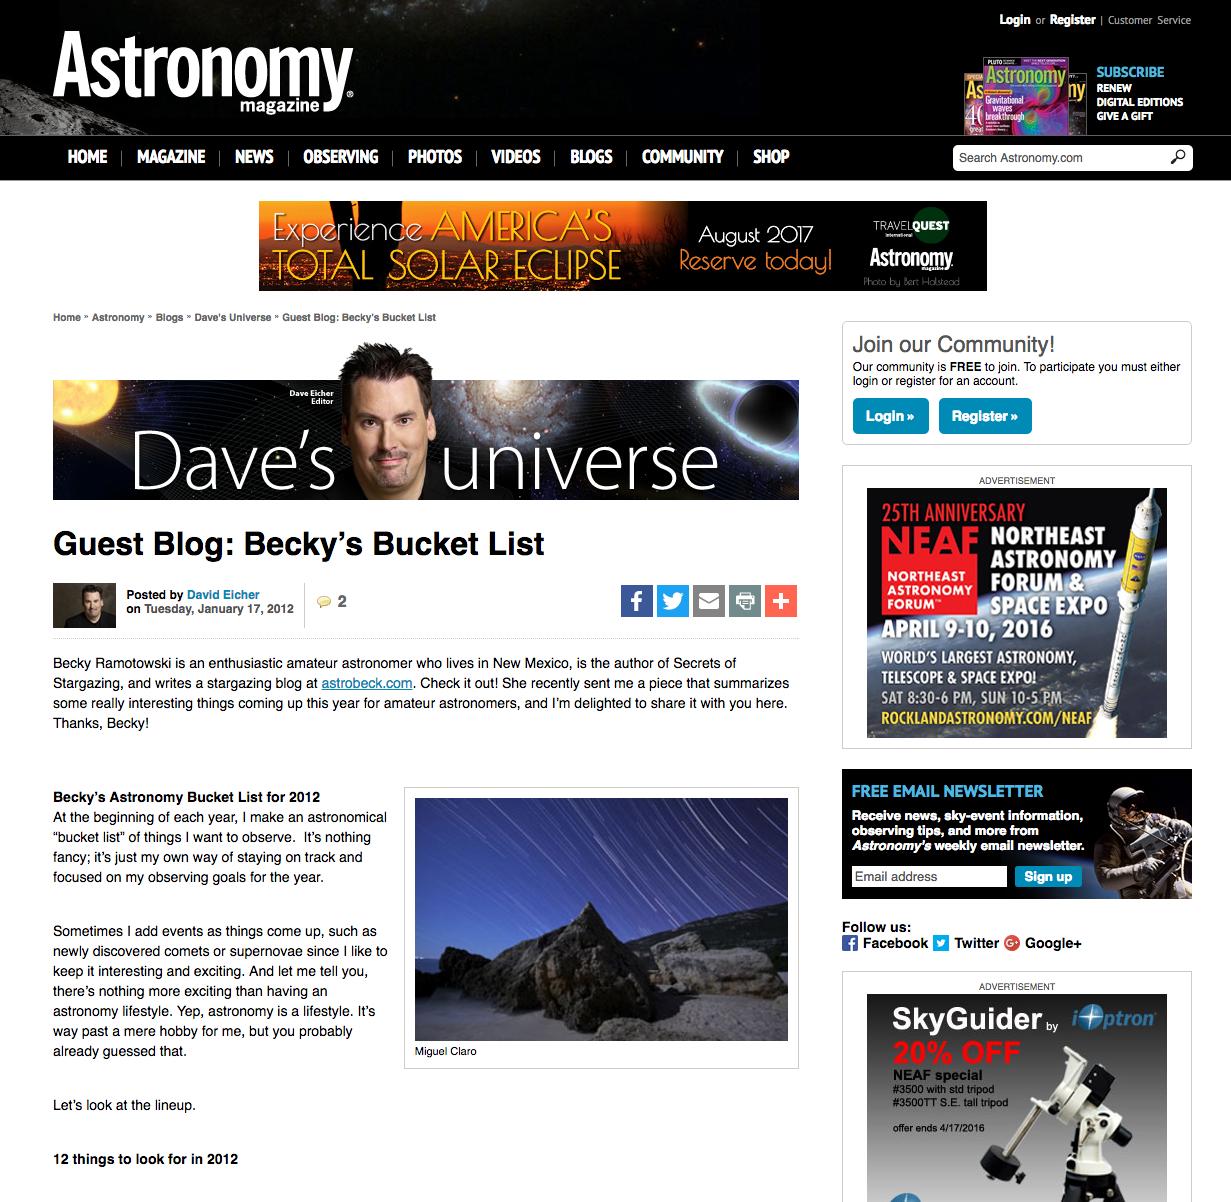 AstronomyMagOnline-BeckysList-17Jan2012